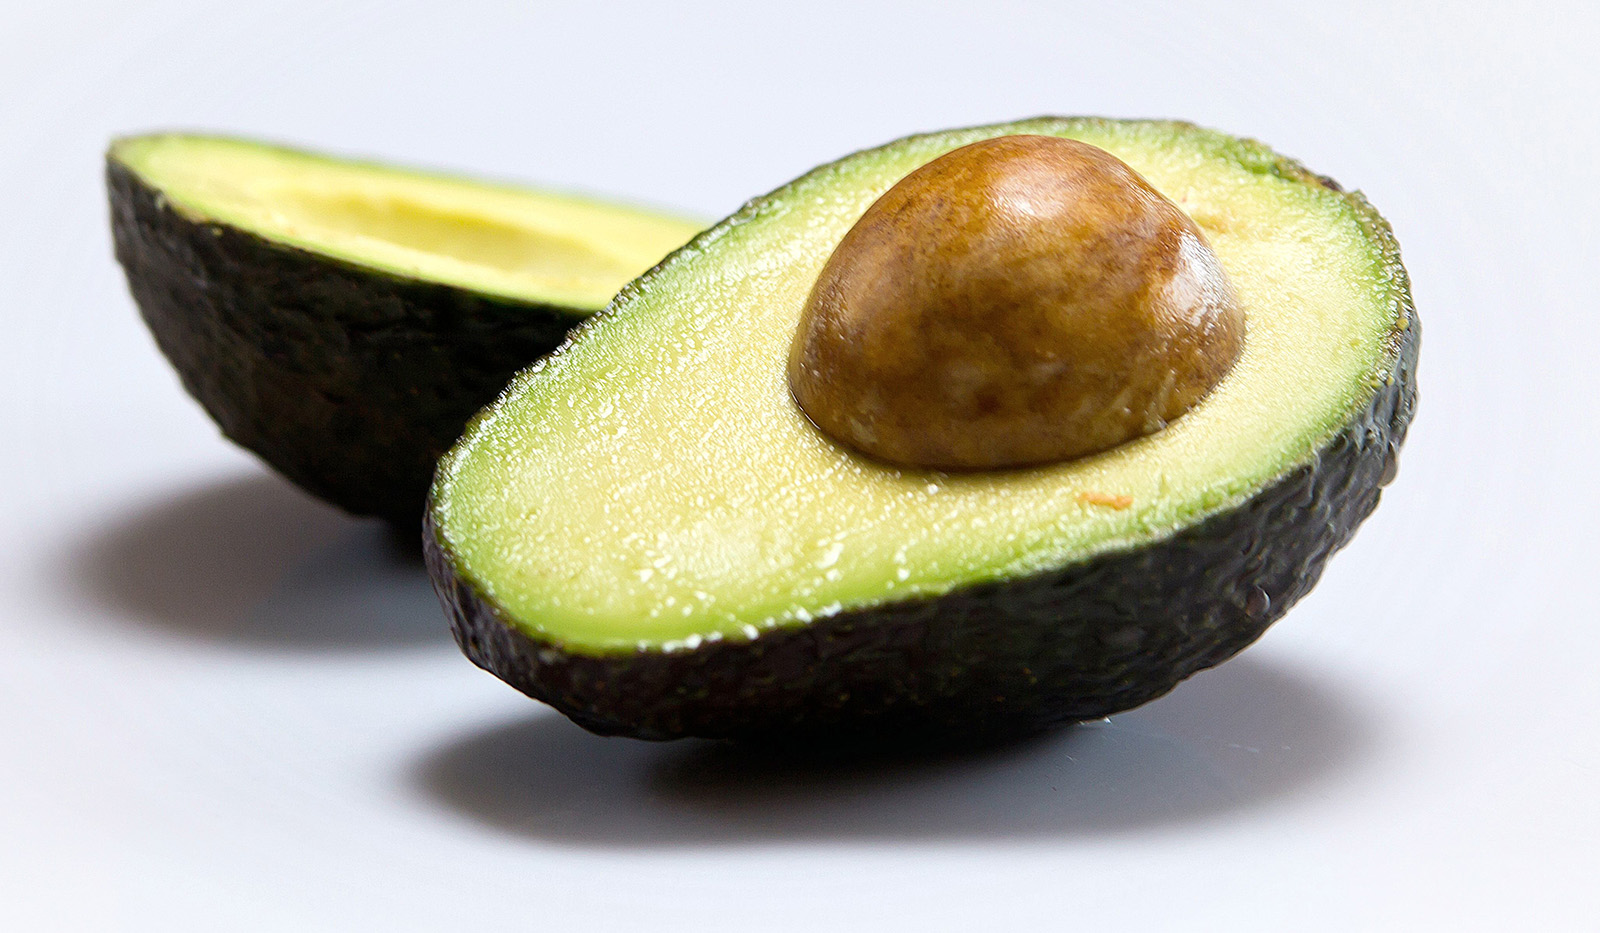 aguacate avocado